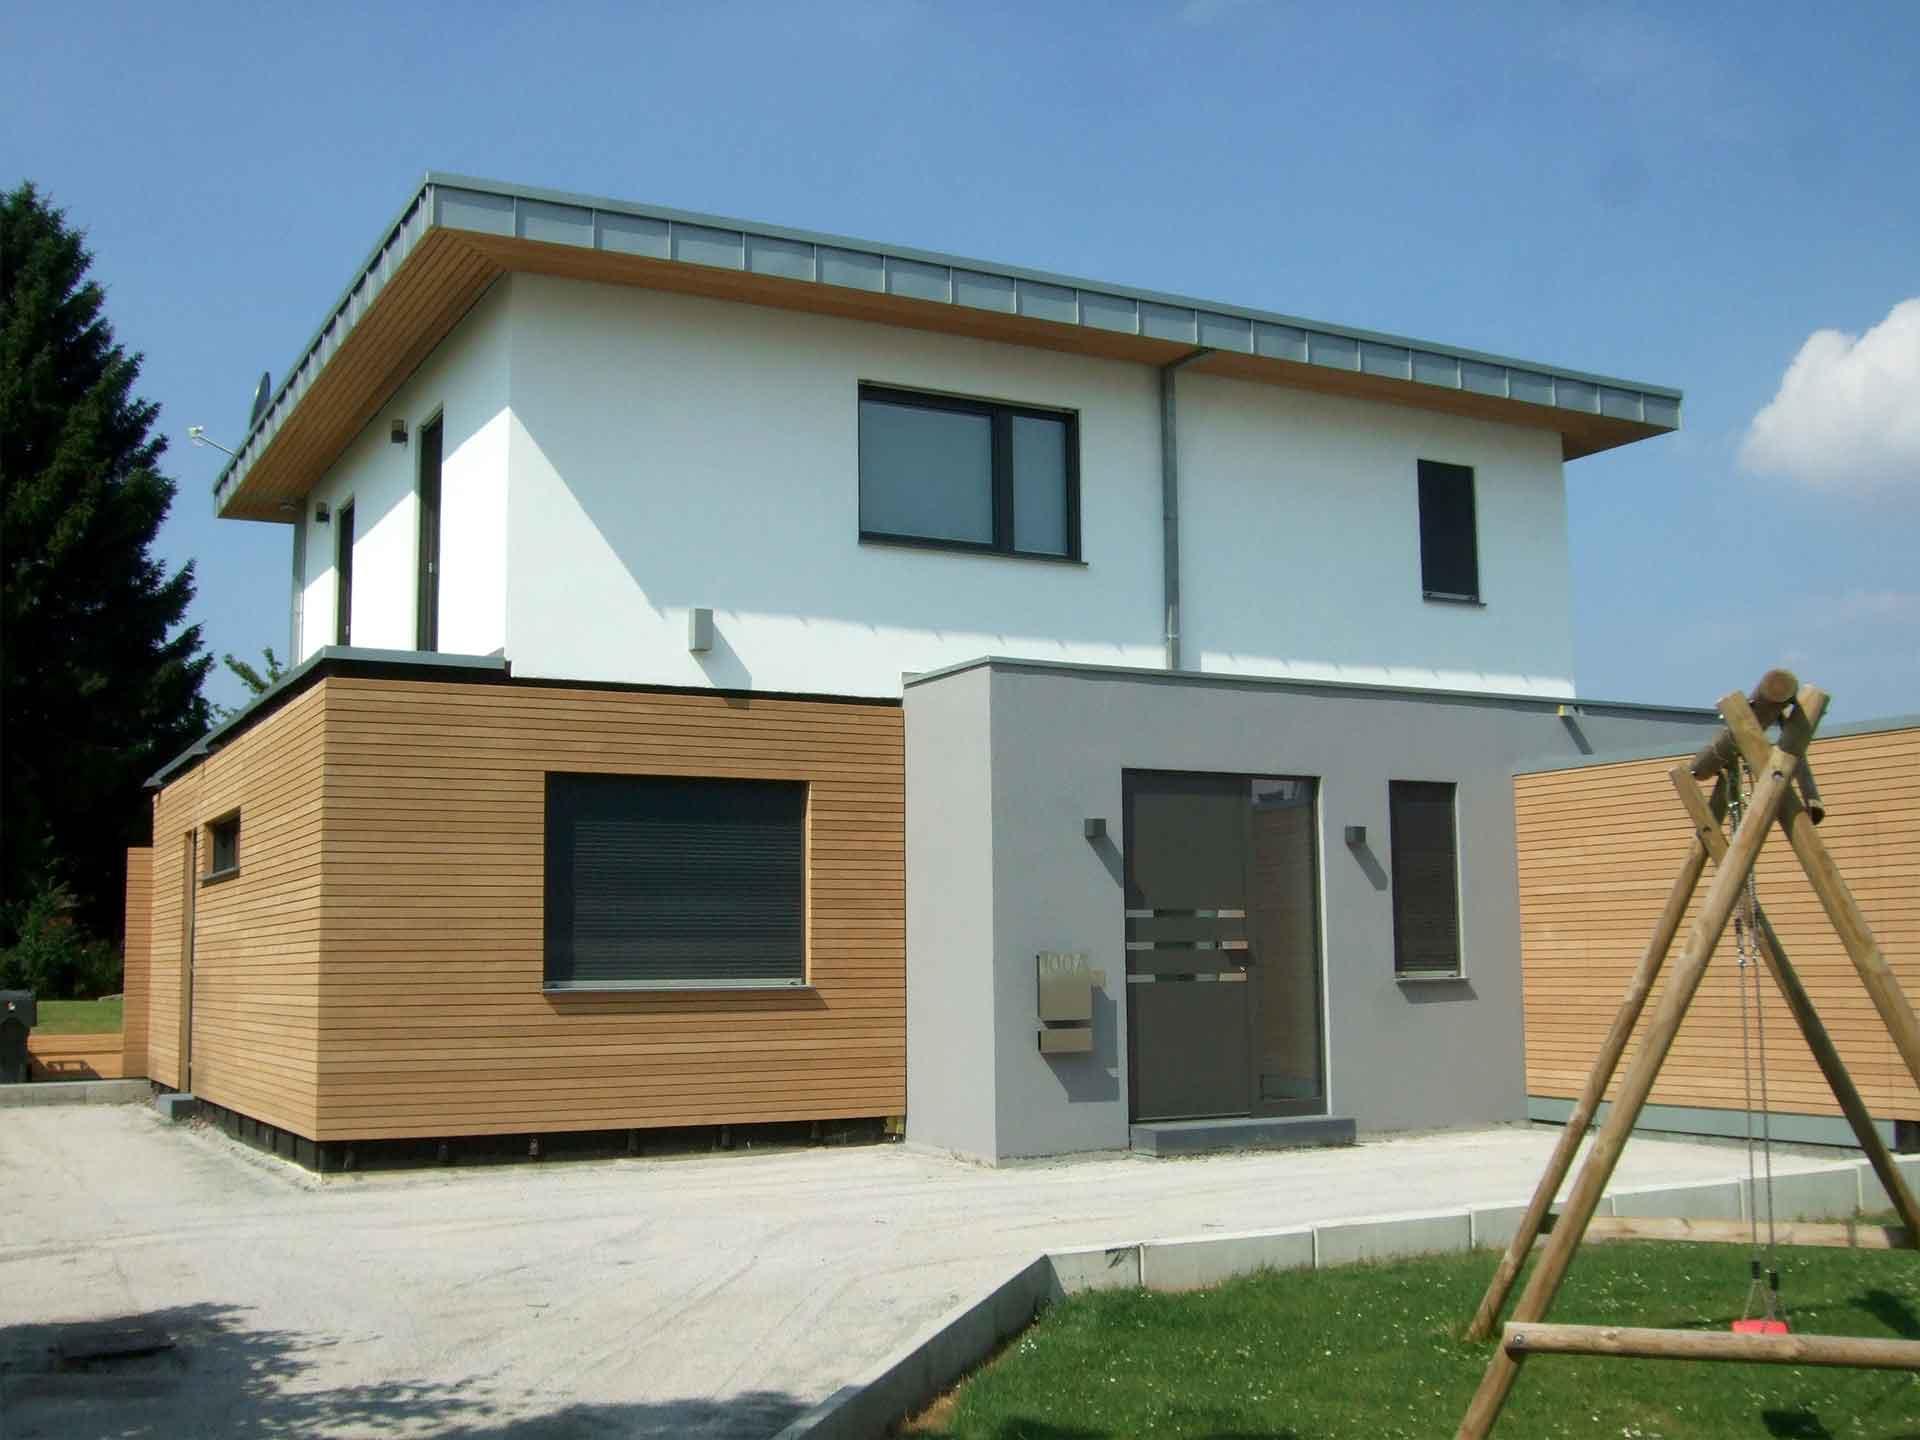 Holzbau Grote Stadtvilla